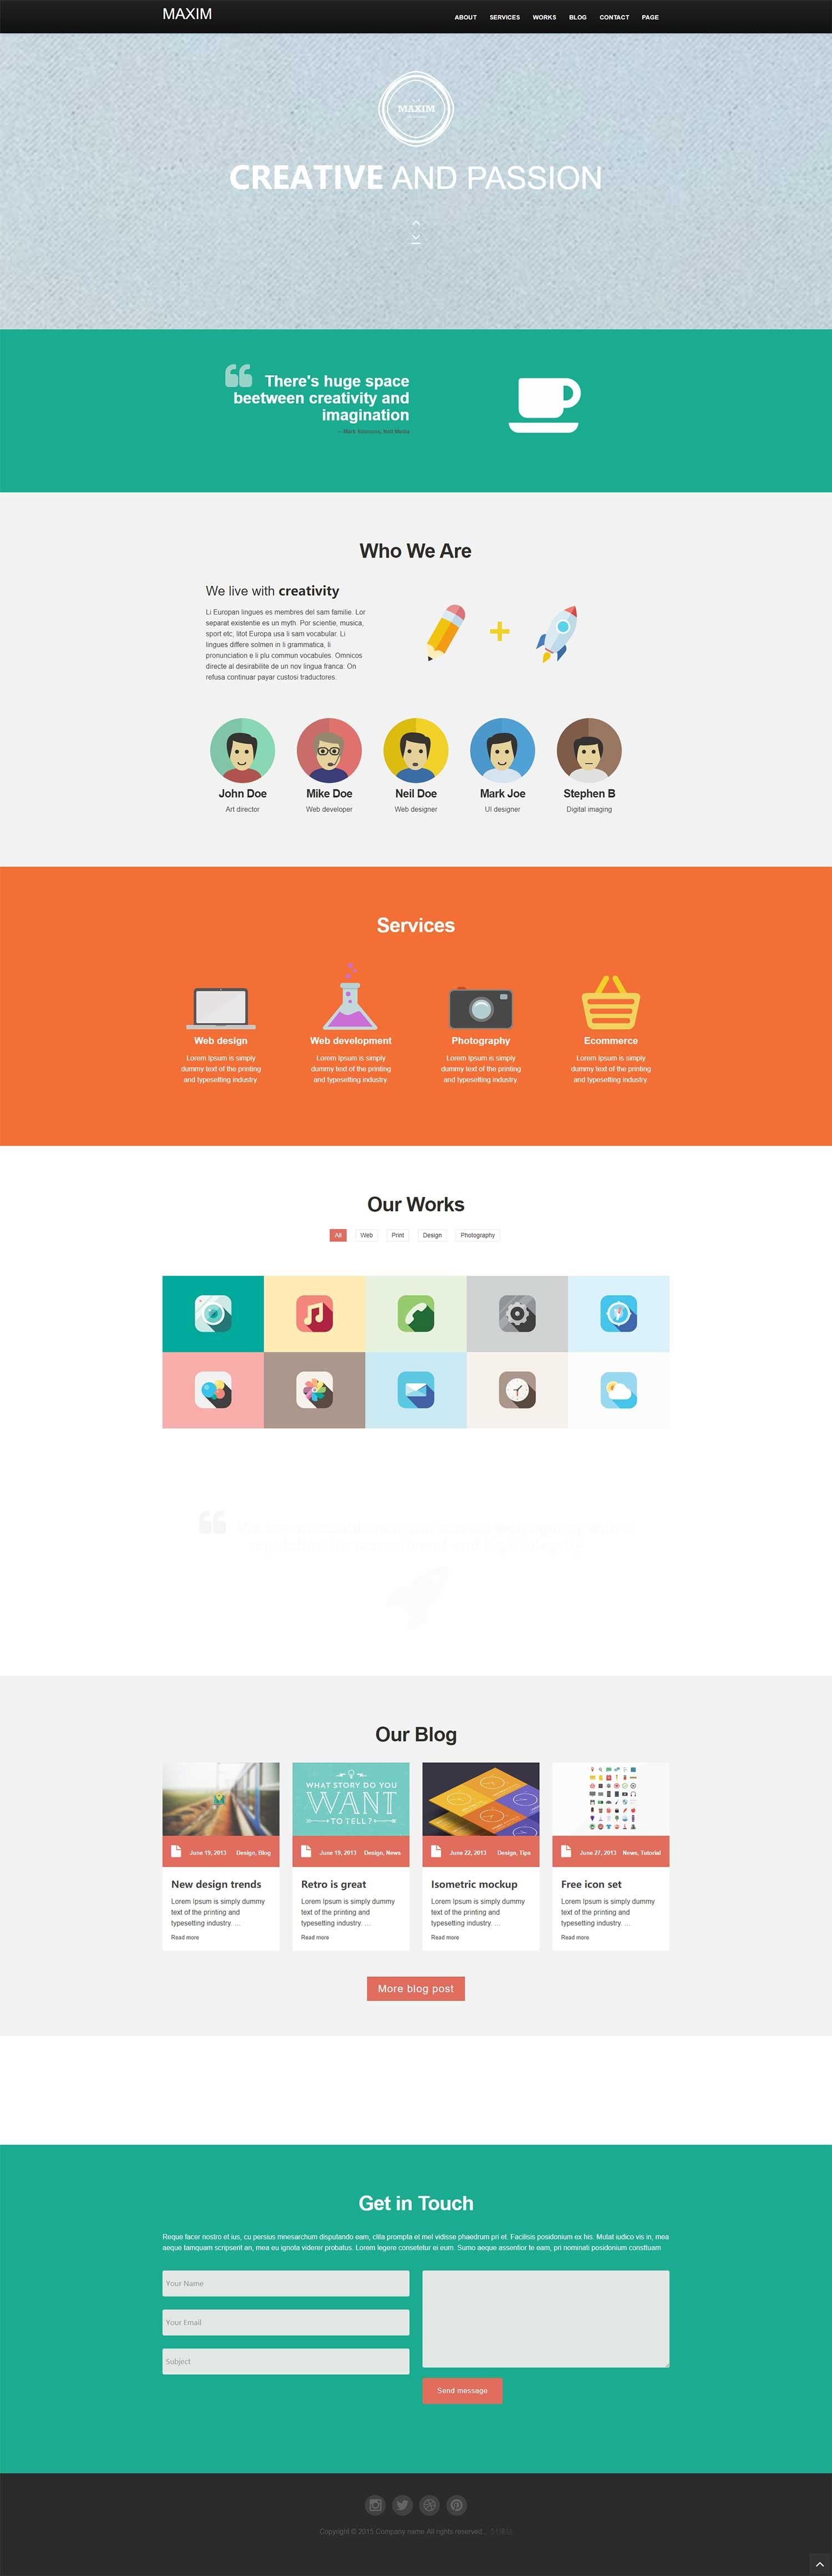 HTML5大气扁平设计单页模板是一款动感大气的个人企业产品展示网站模板